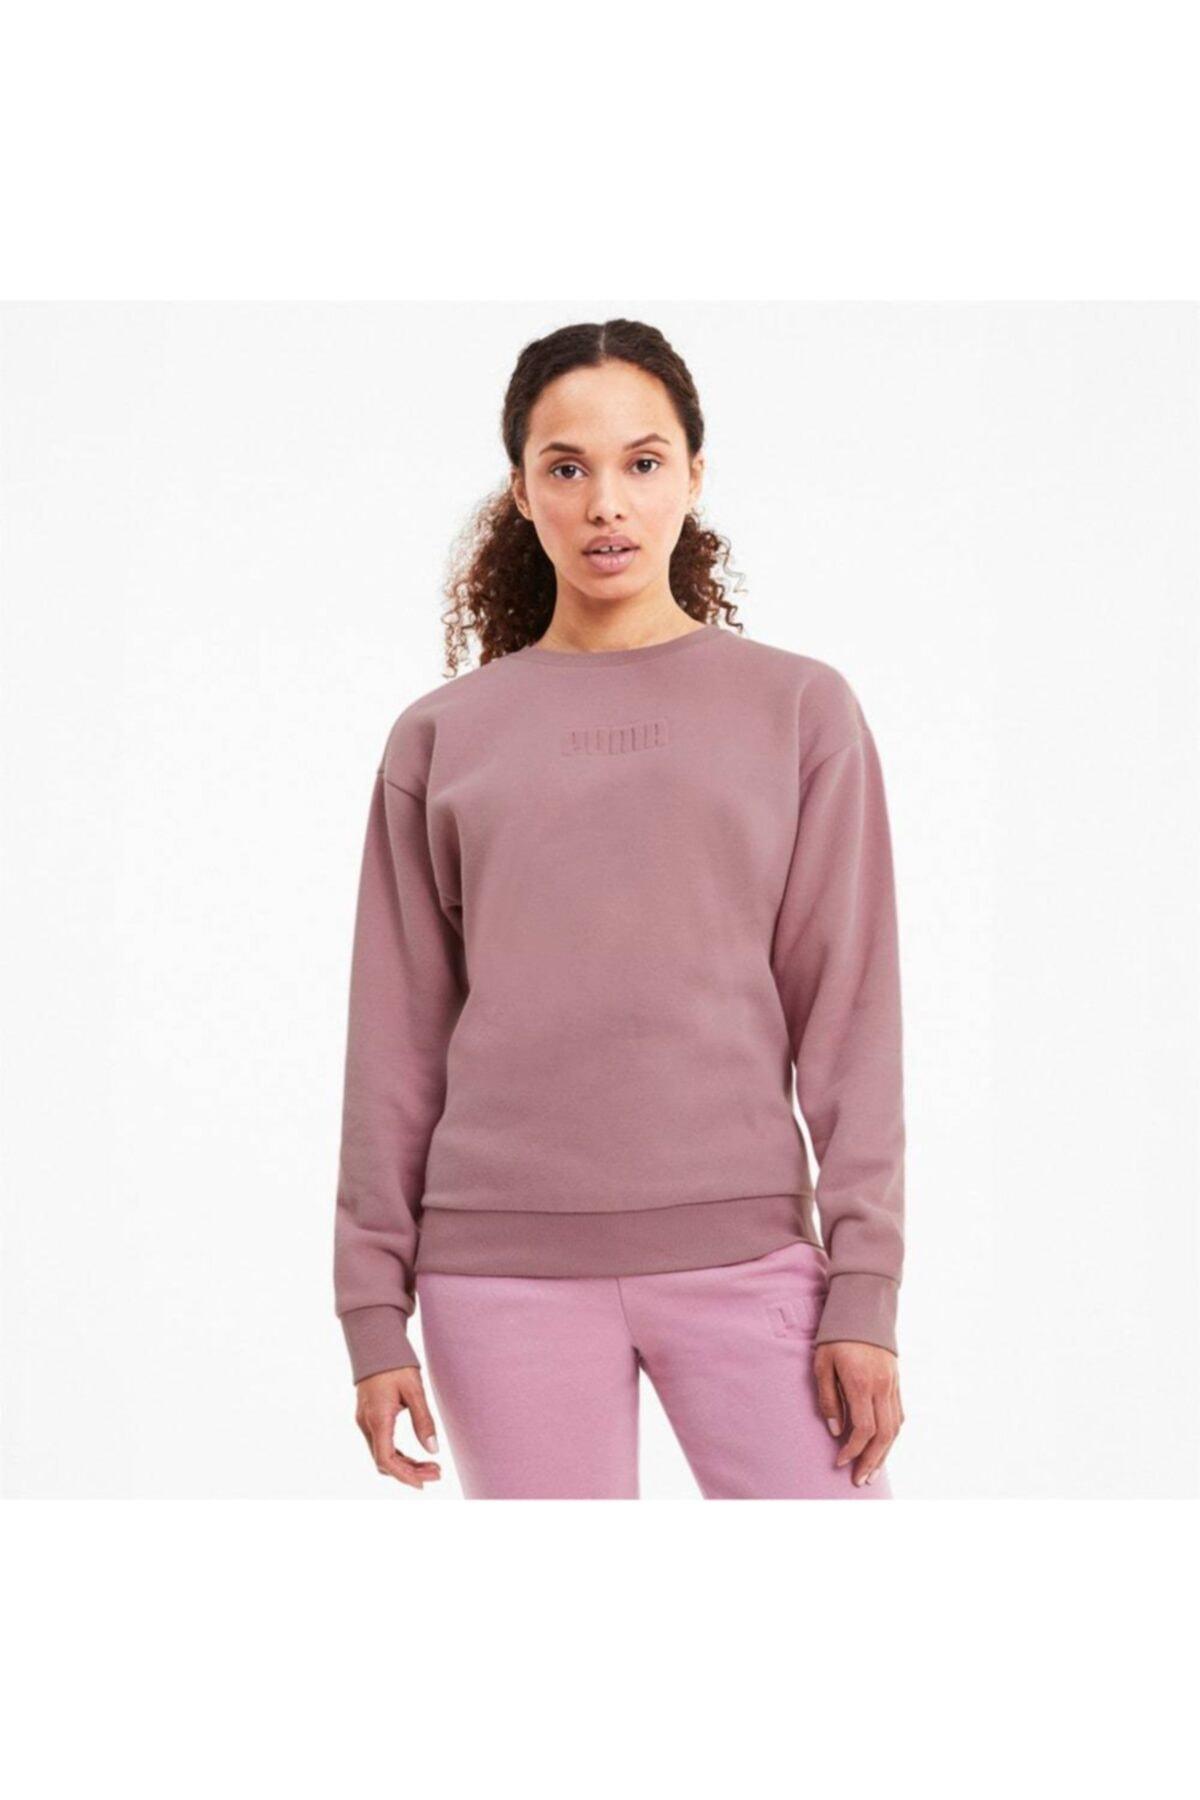 Puma MODERN BASICS CREW FL Pembe Kadın Sweatshirt 101119453 1